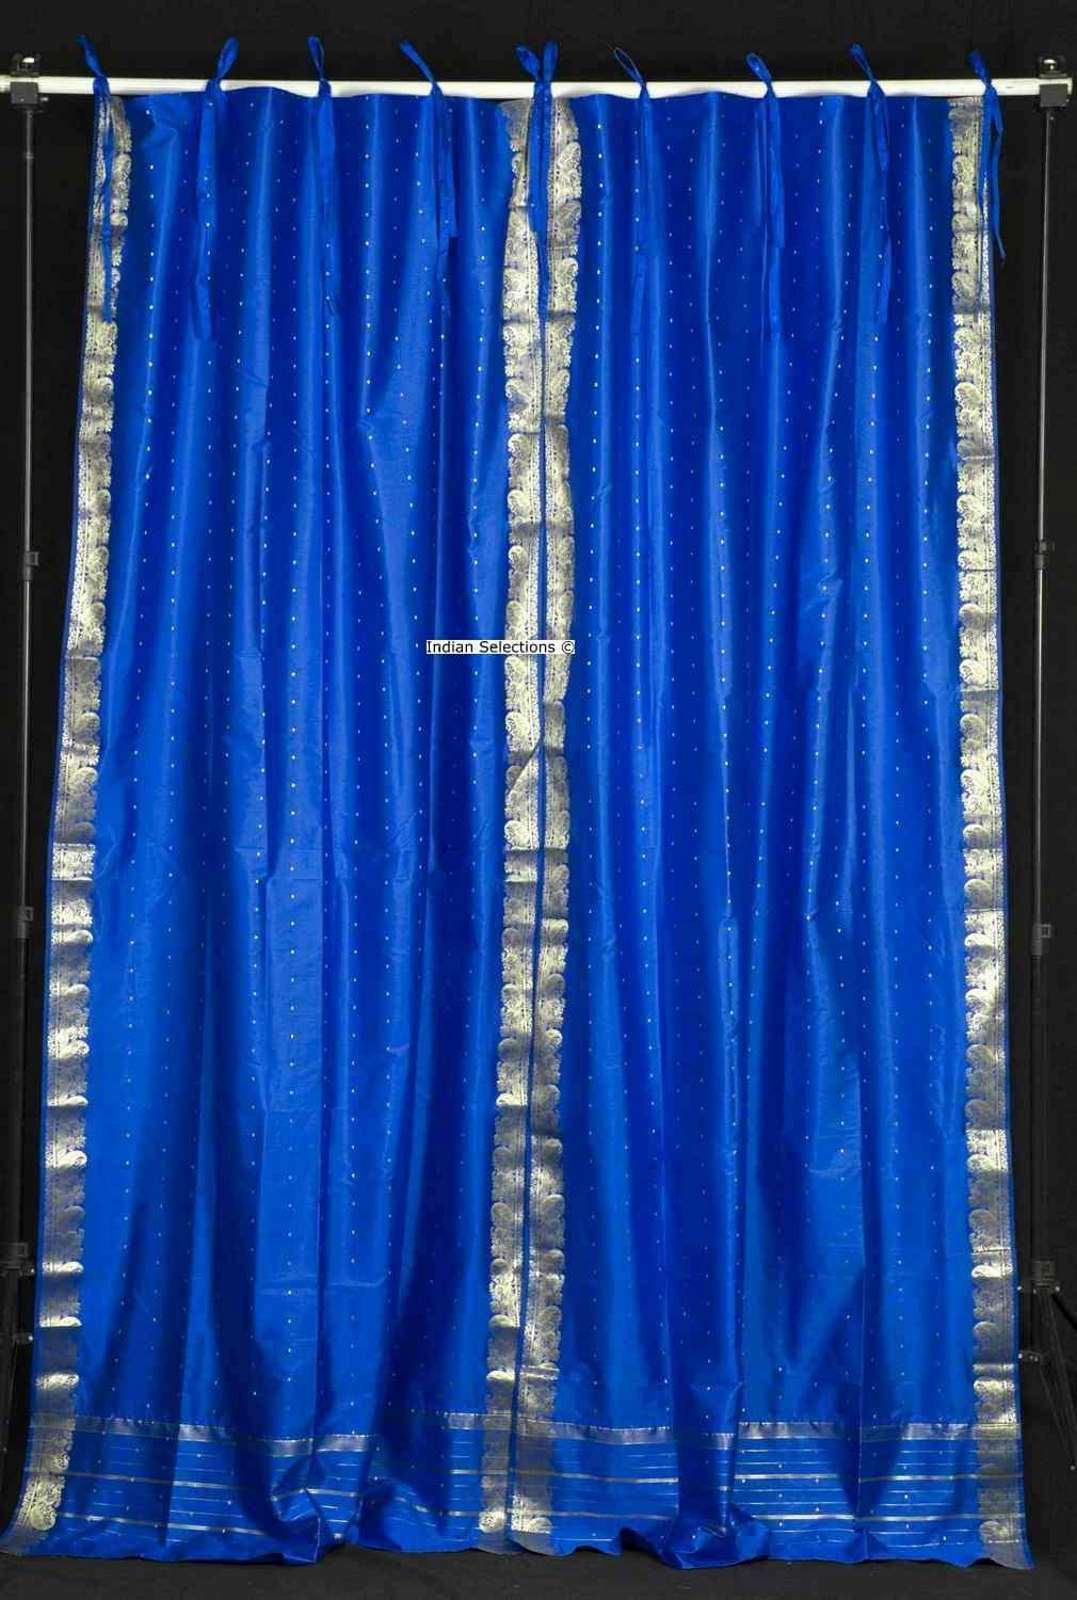 Lined-Island Blue  Tie Top  Sheer Sari Curtain  Drape  - 80W x 120L - Piece